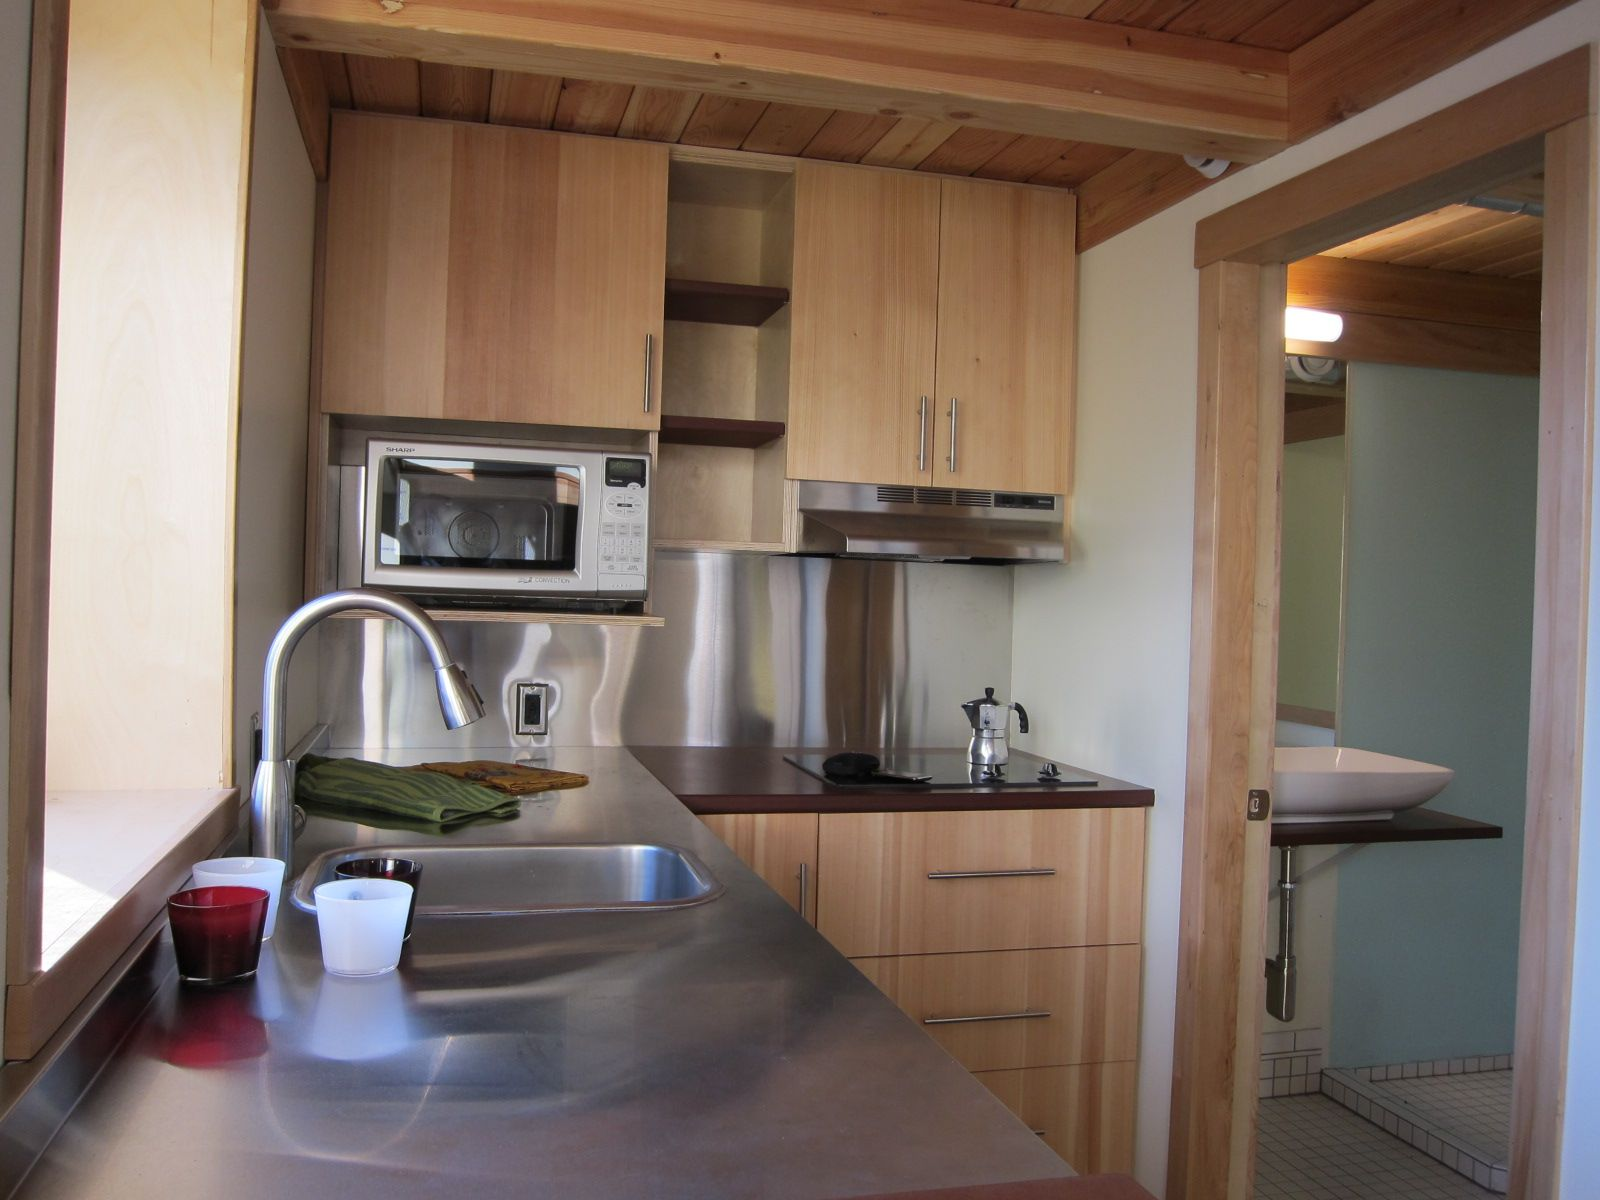 http://st.effectivehouse.com/upl/16/joseph-giampietro-mini-b-kitchen2-via-smallhousebliss.jpg